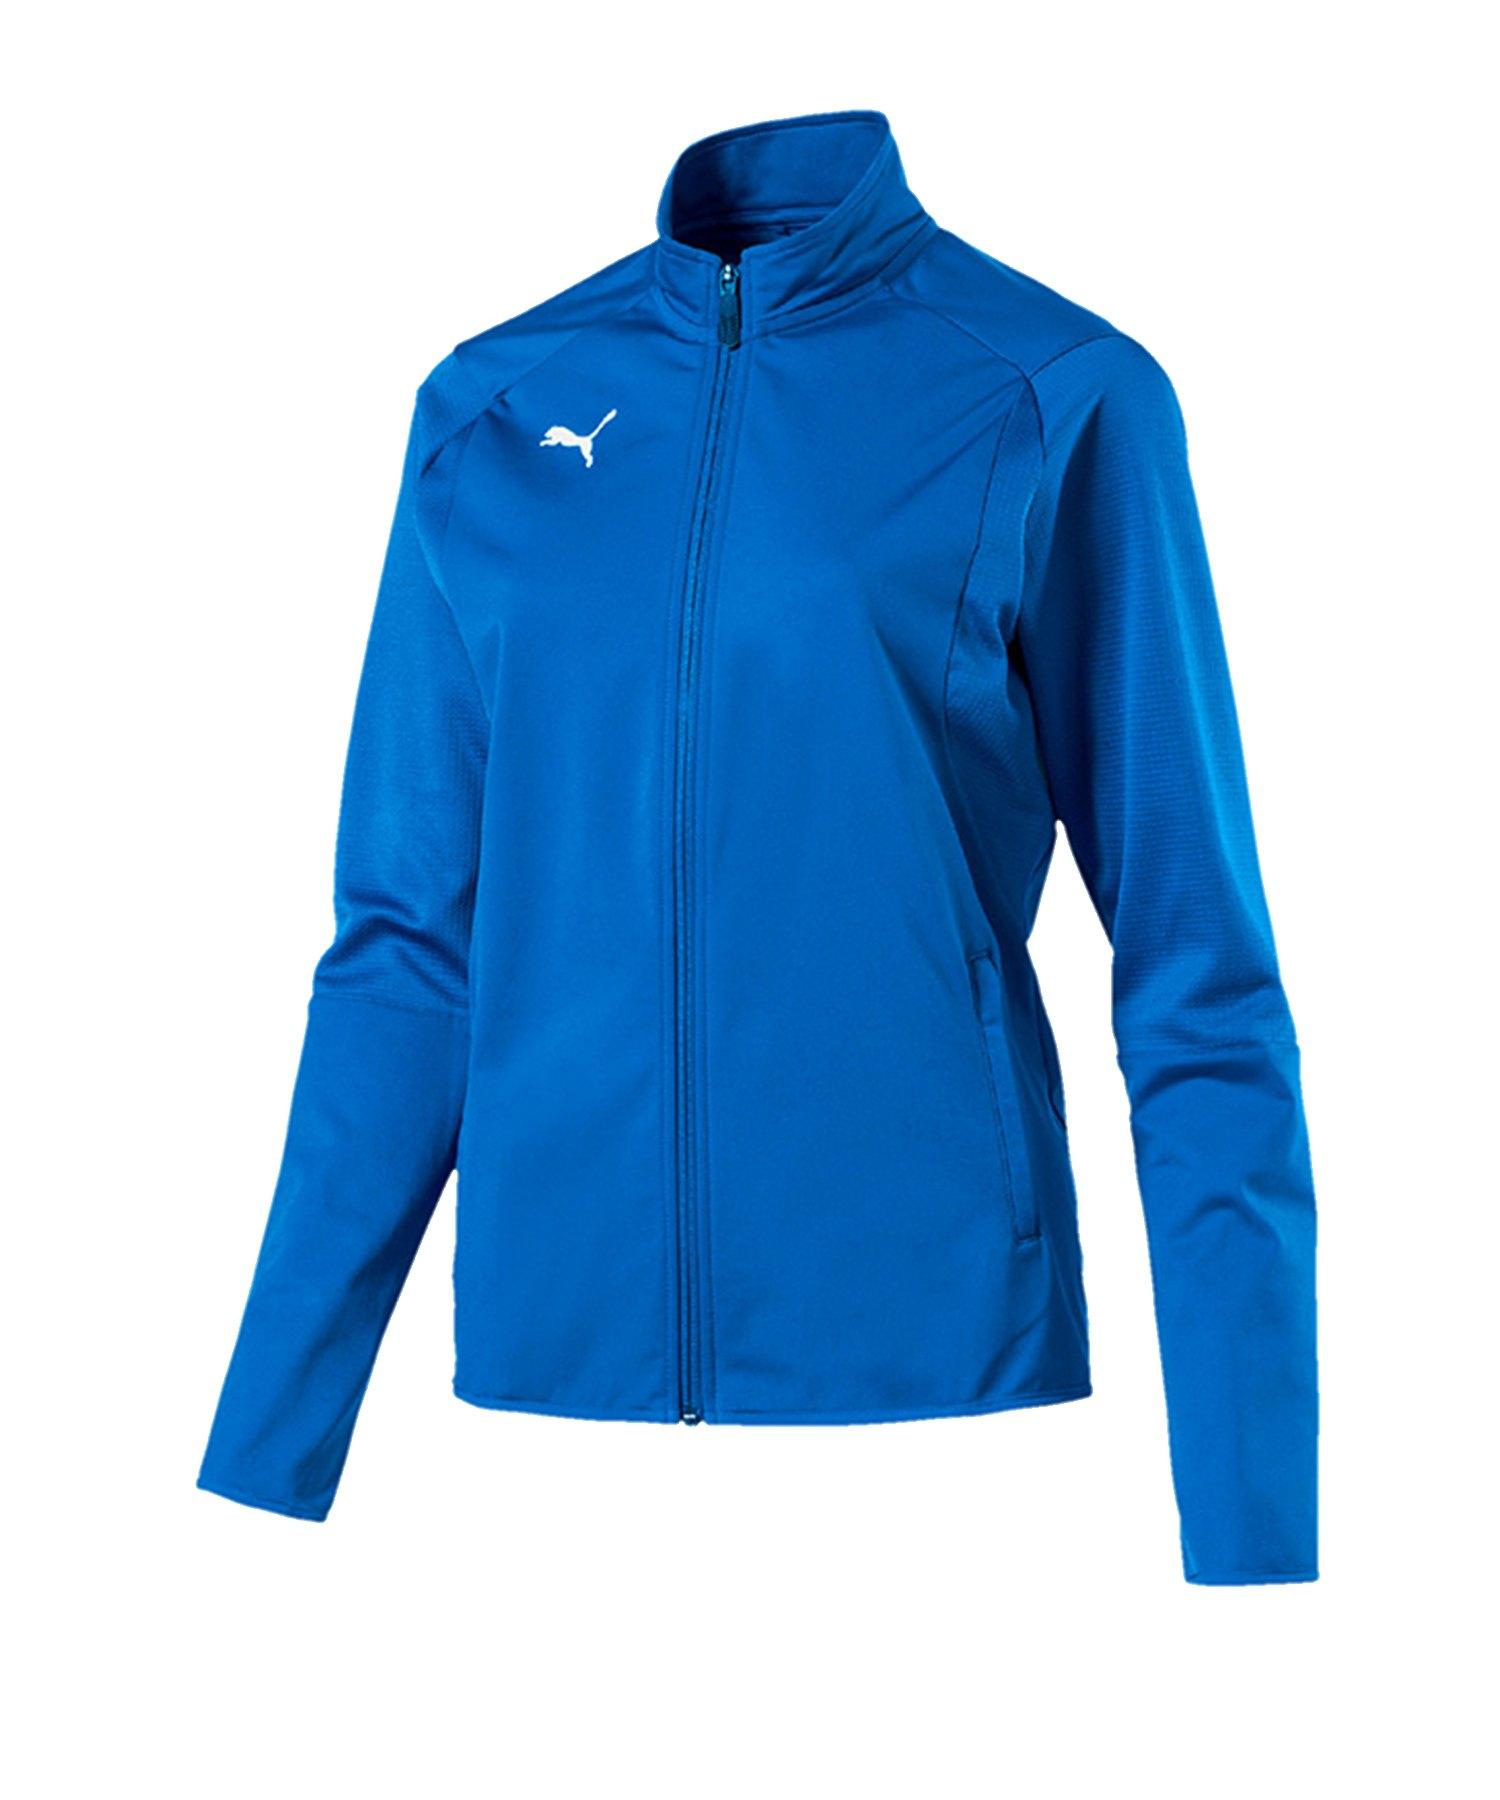 PUMA LIGA Trainingsjacke Damen Blau F02 - blau